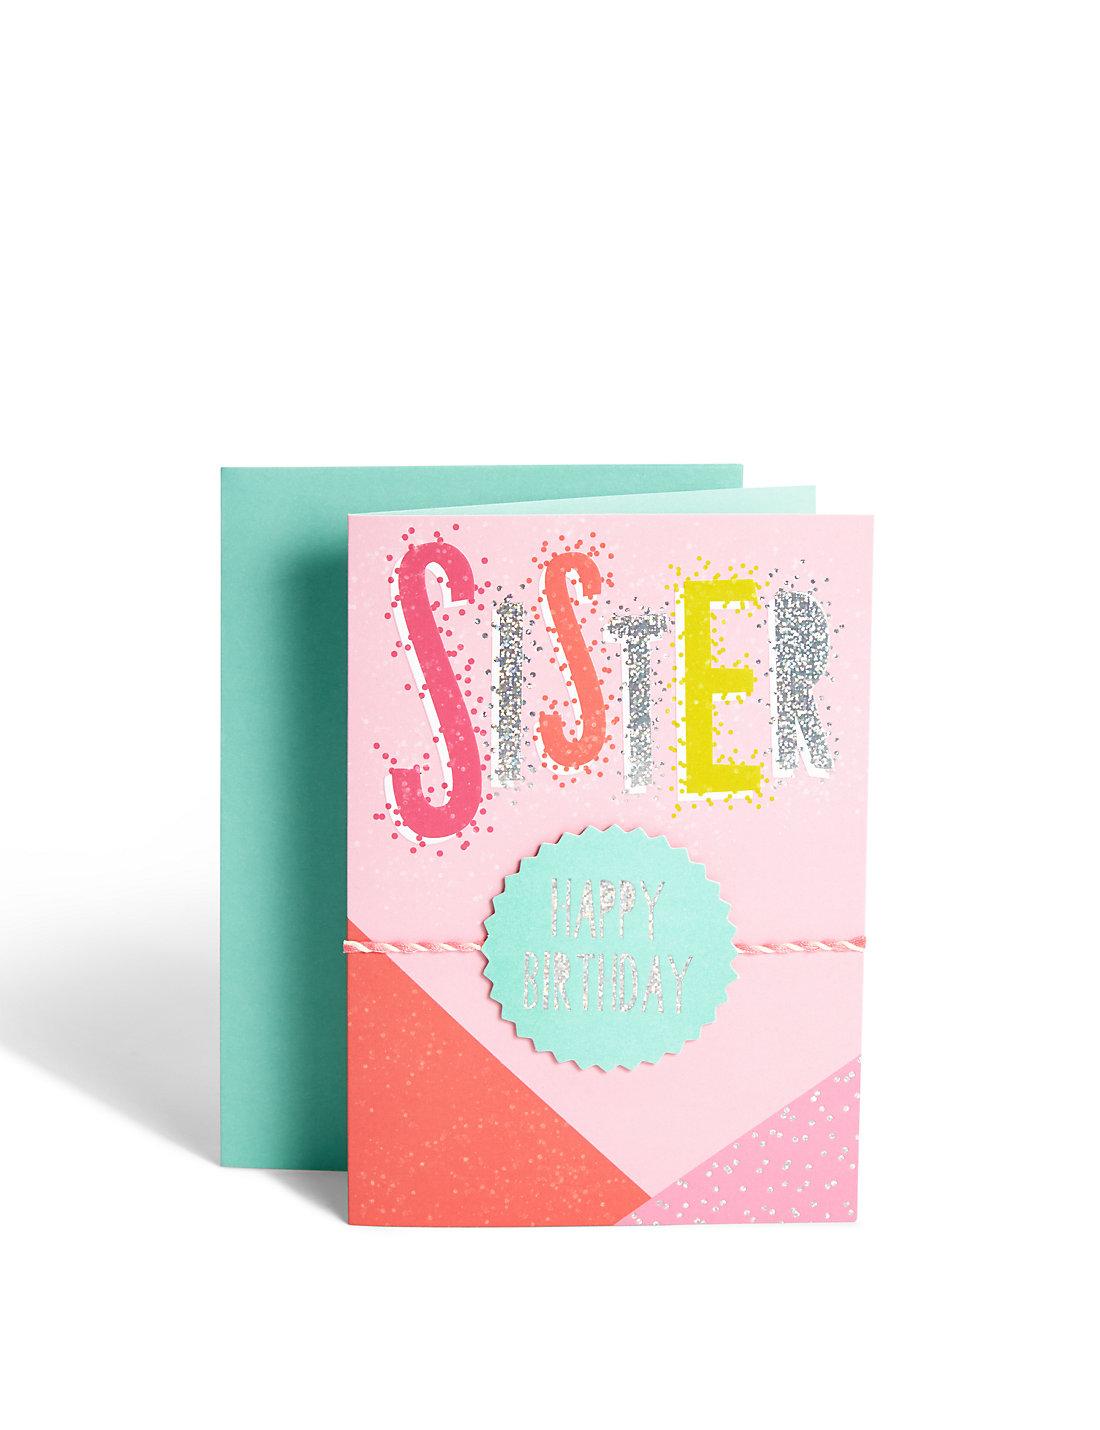 Sister Text Birthday Card – How to Text a Birthday Card